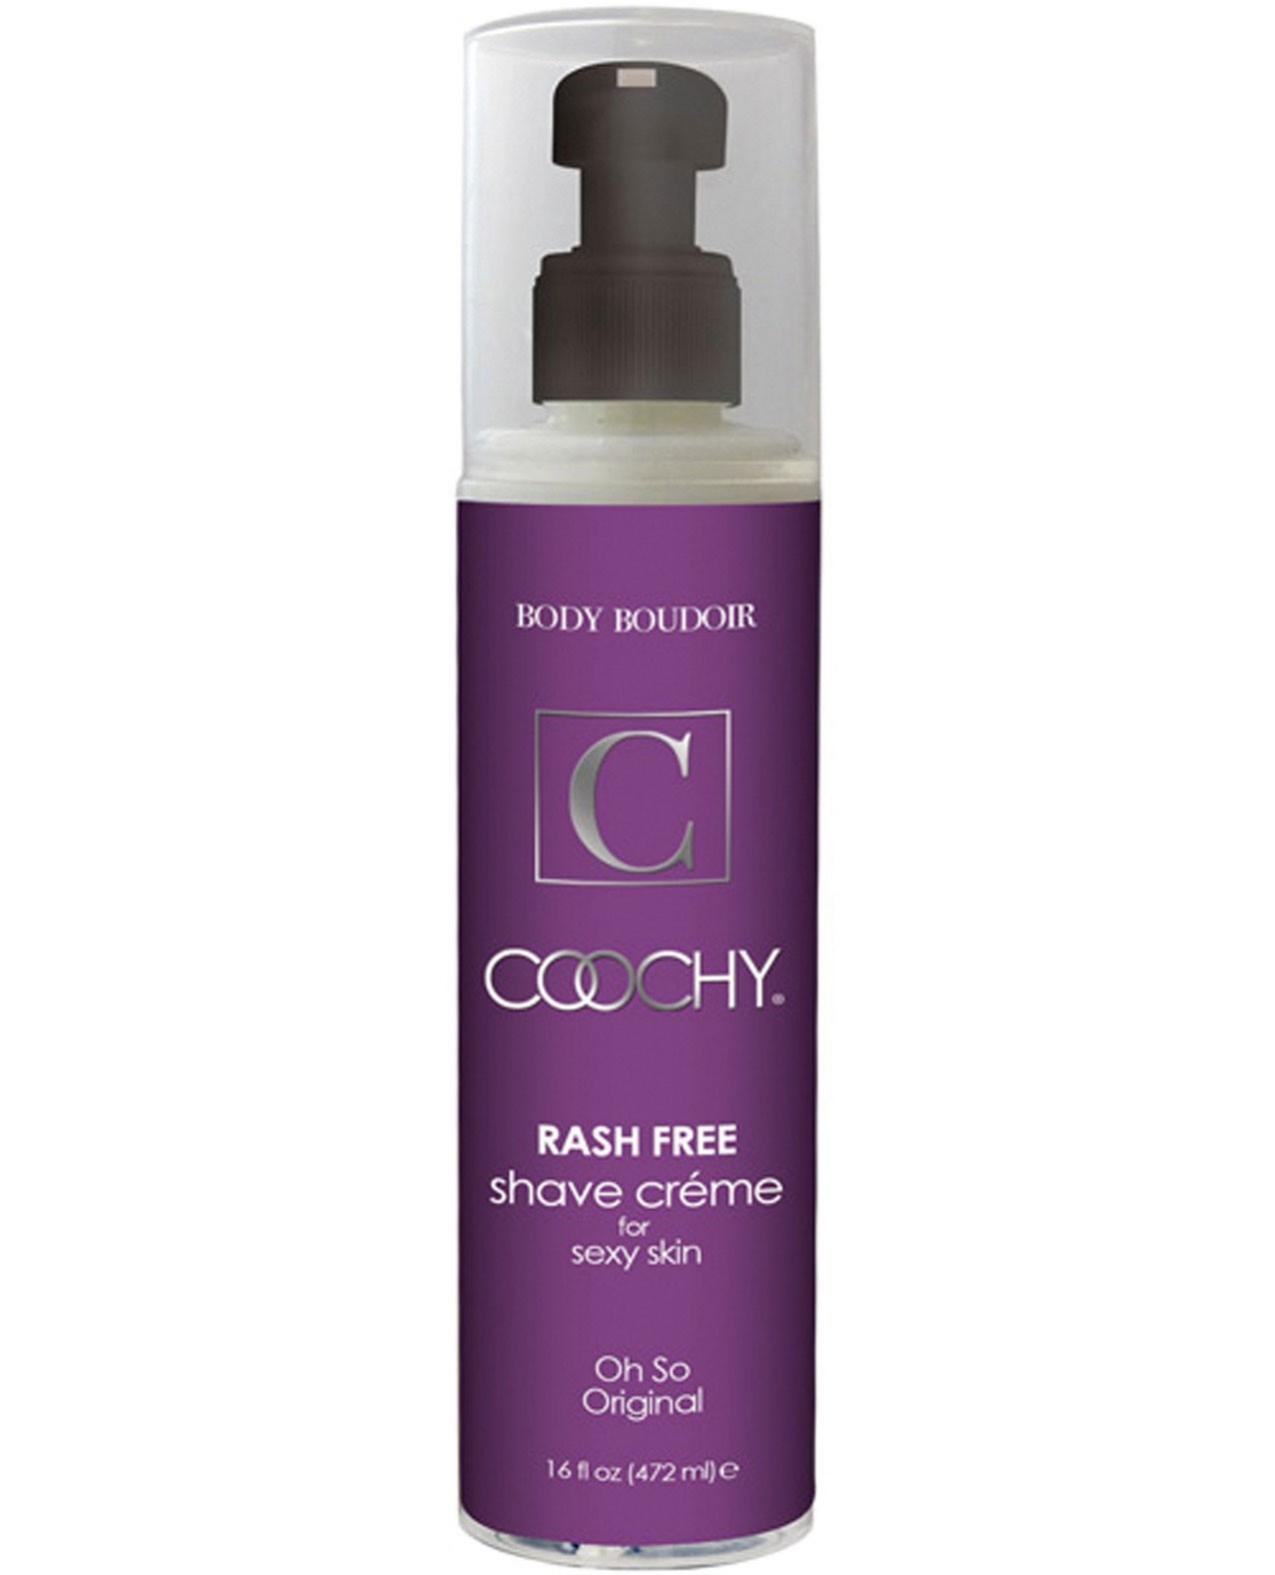 Coochy Rashfree Shave Creme - 16 oz Original